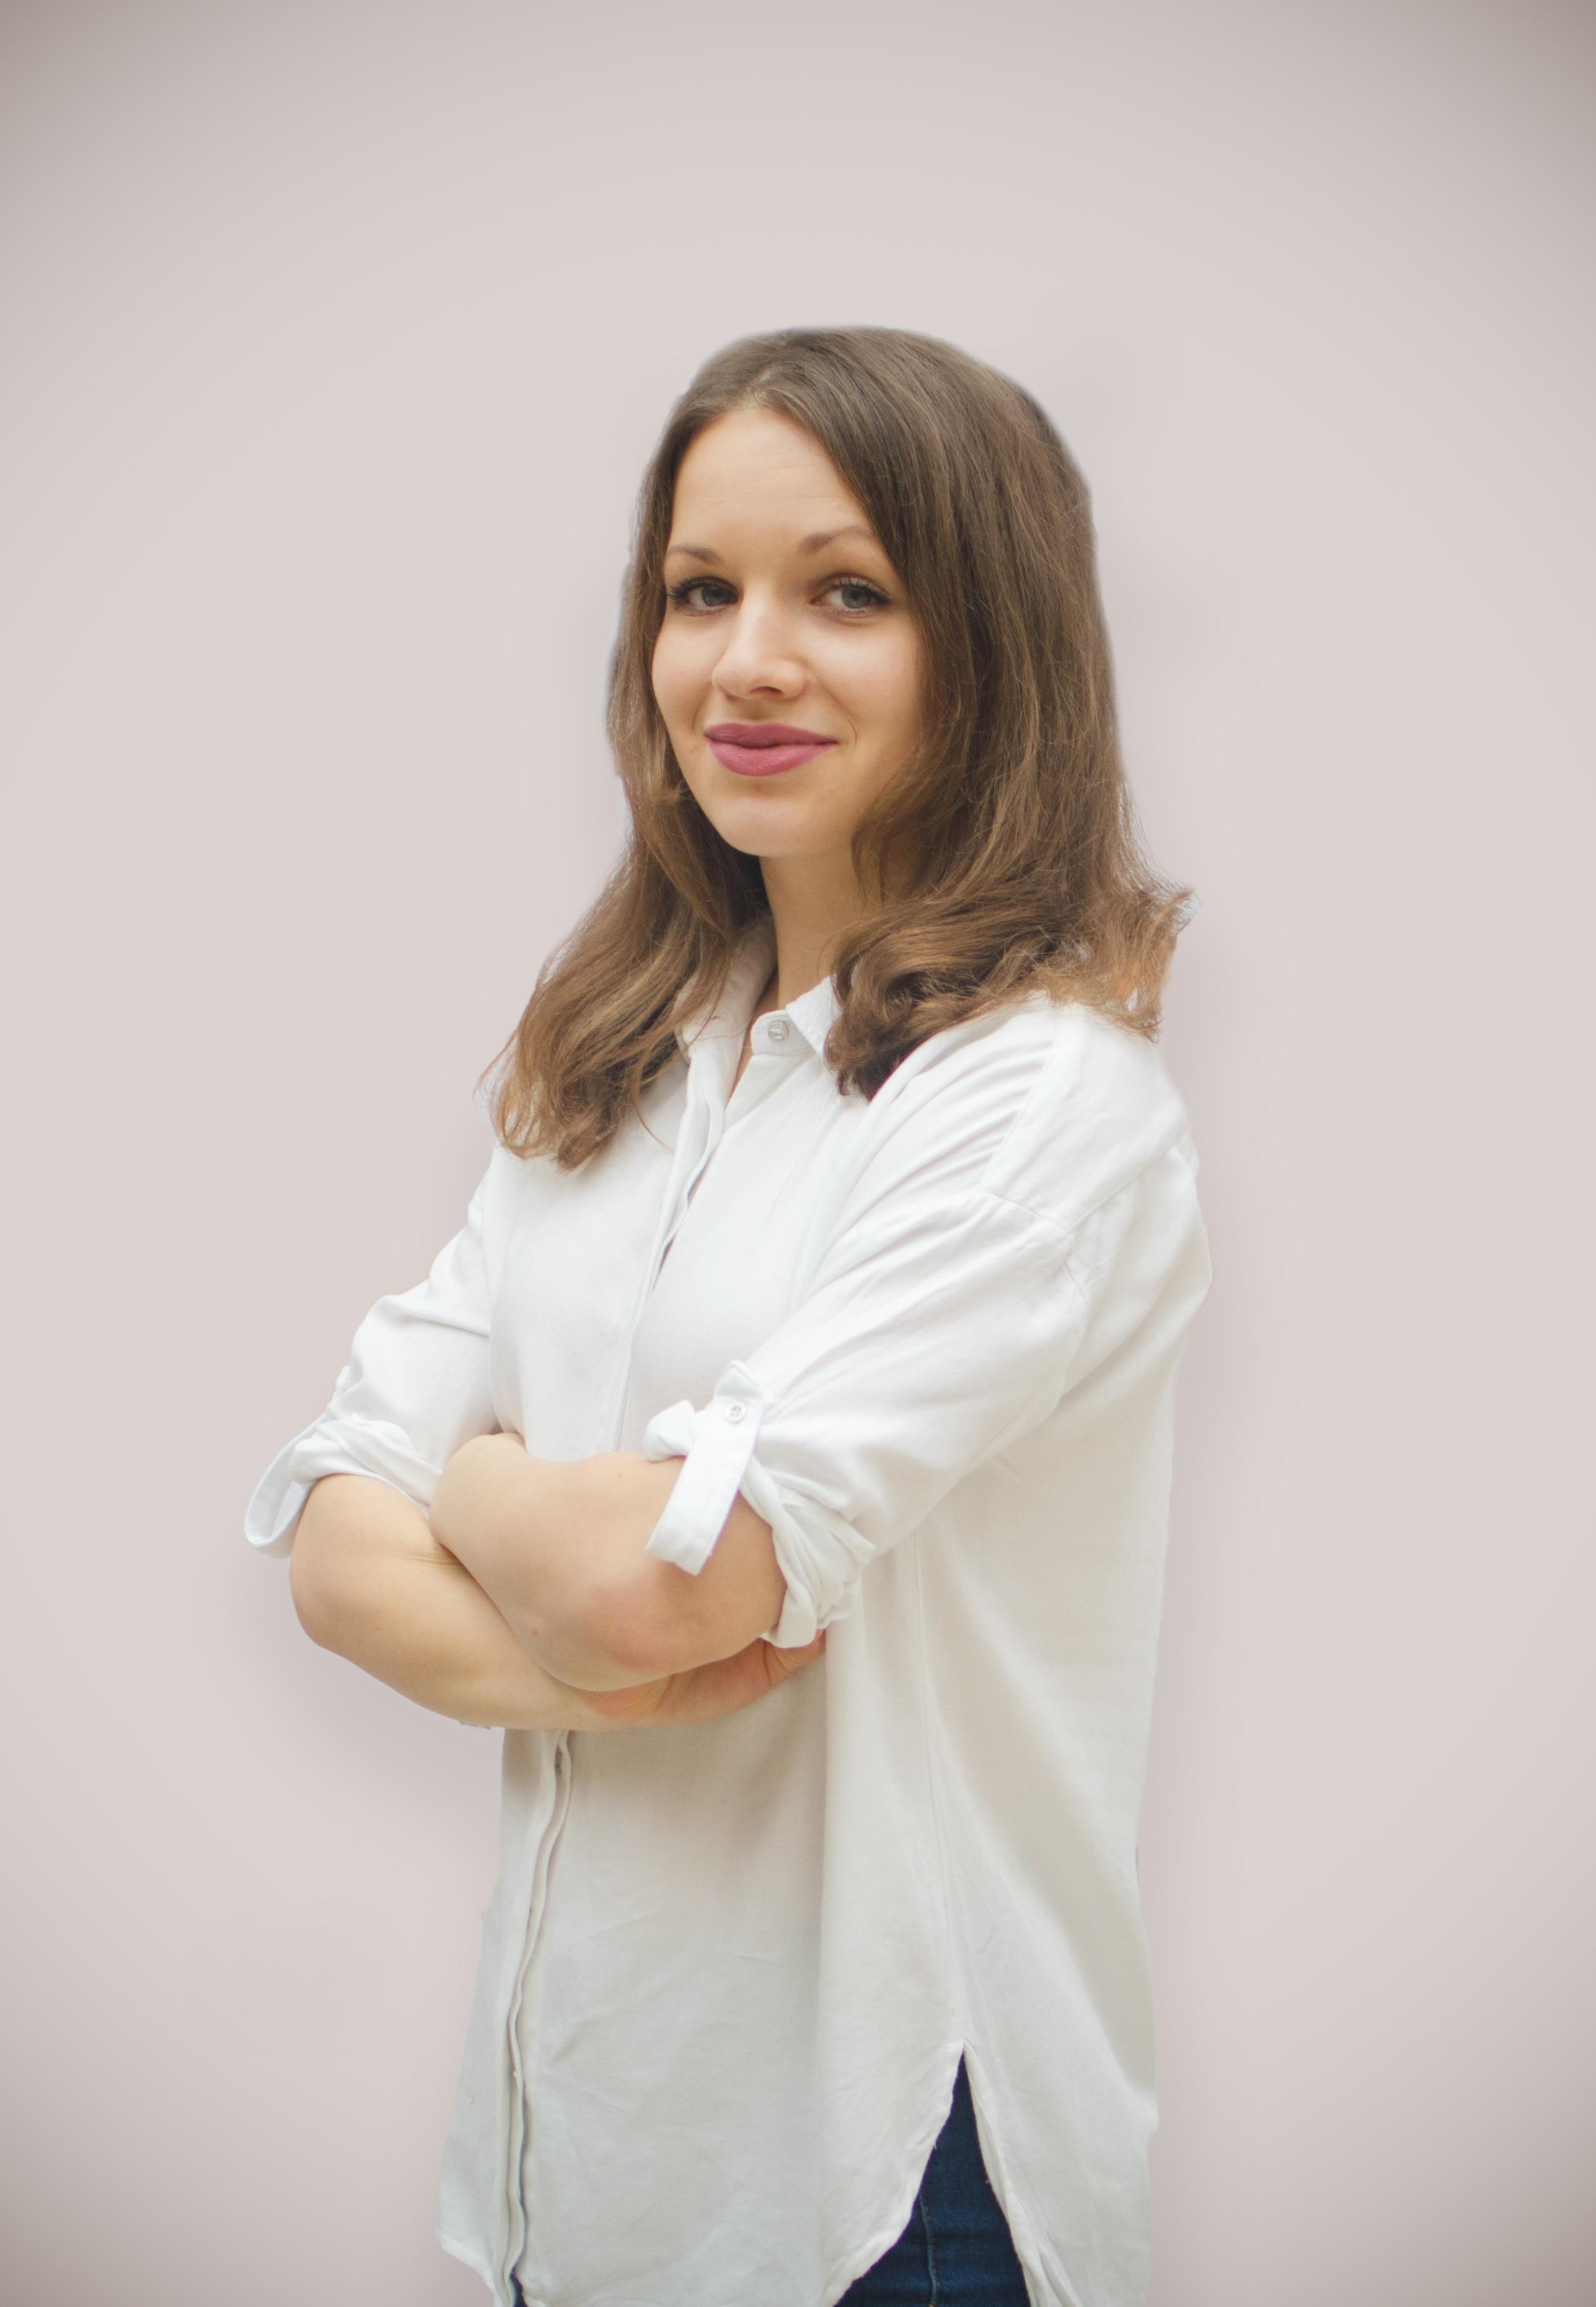 Weronika Kryczka